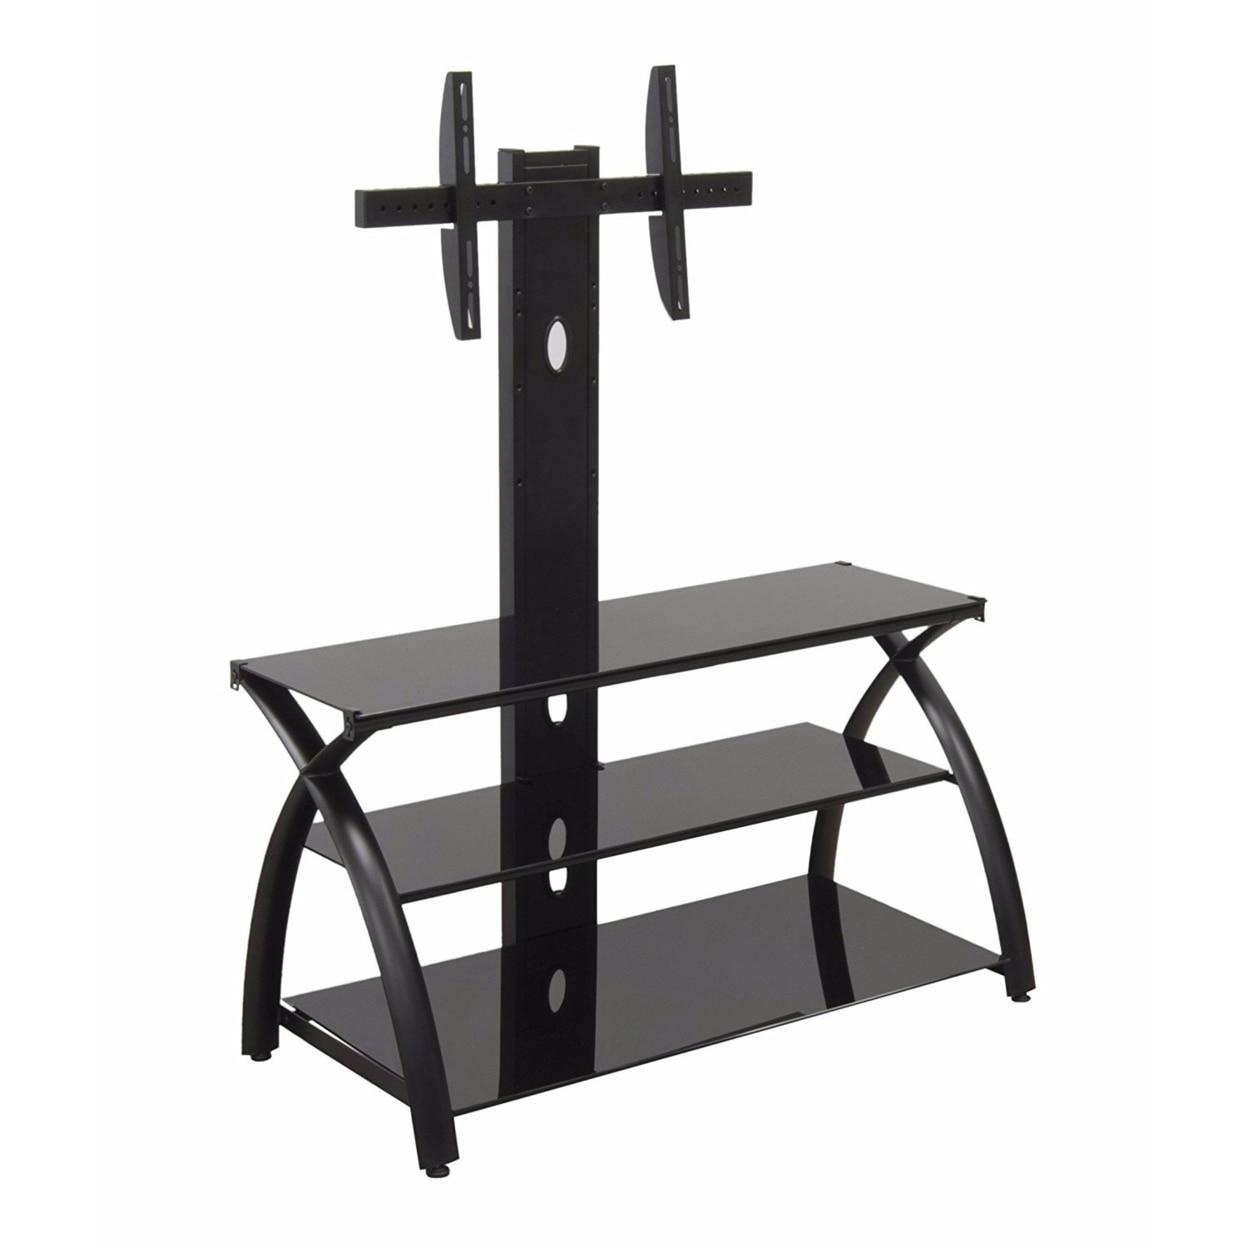 купить Offex Home Office Futura TV Stand with Tower Glass - Black/Black недорого